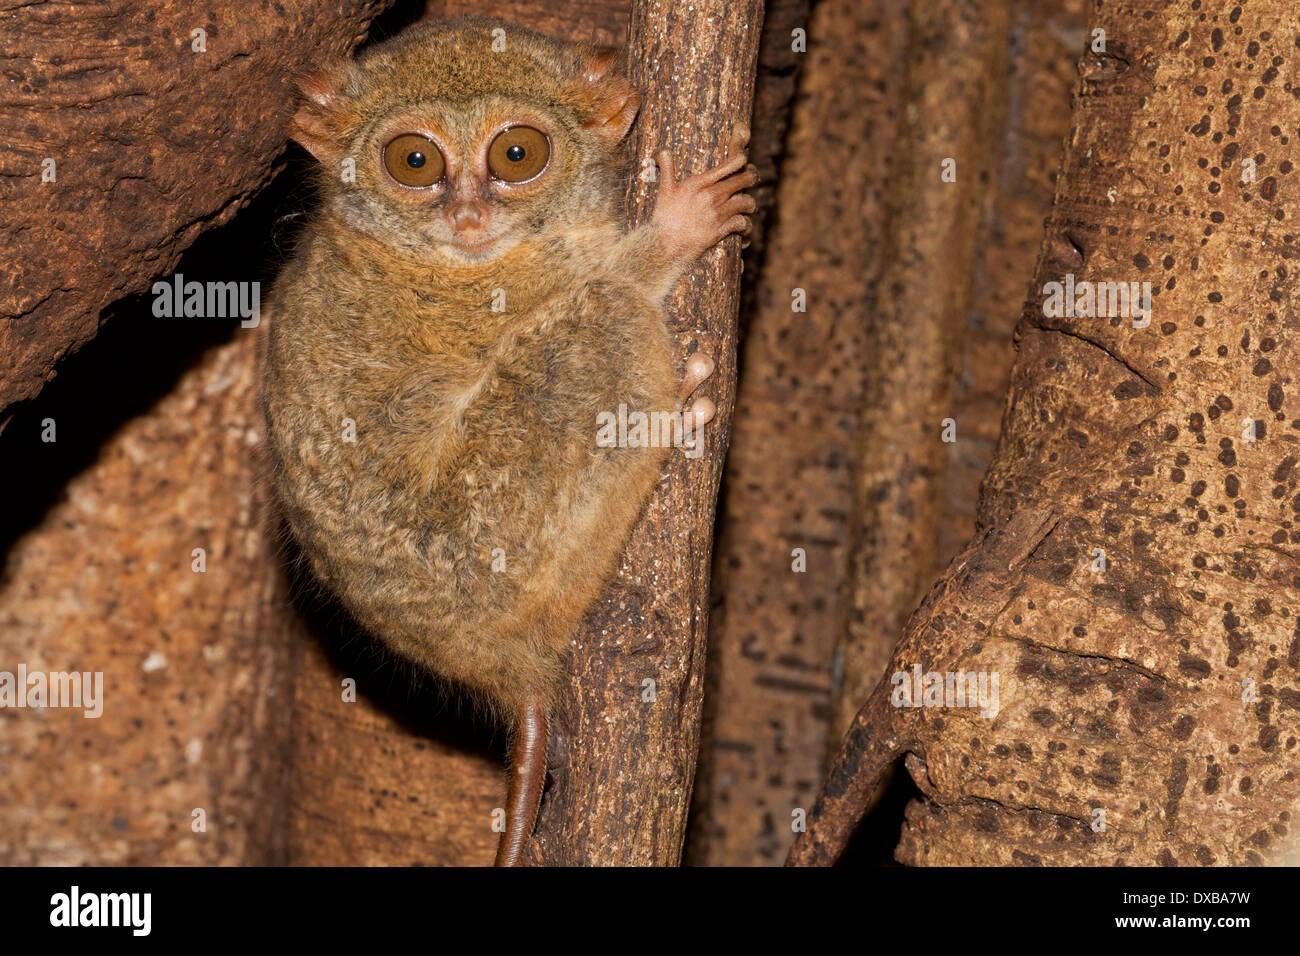 Spectral Tarsier, Tarsius tarsier, Tangkoko Naitonal Park, Sulawesi Indonesia - Stock Image